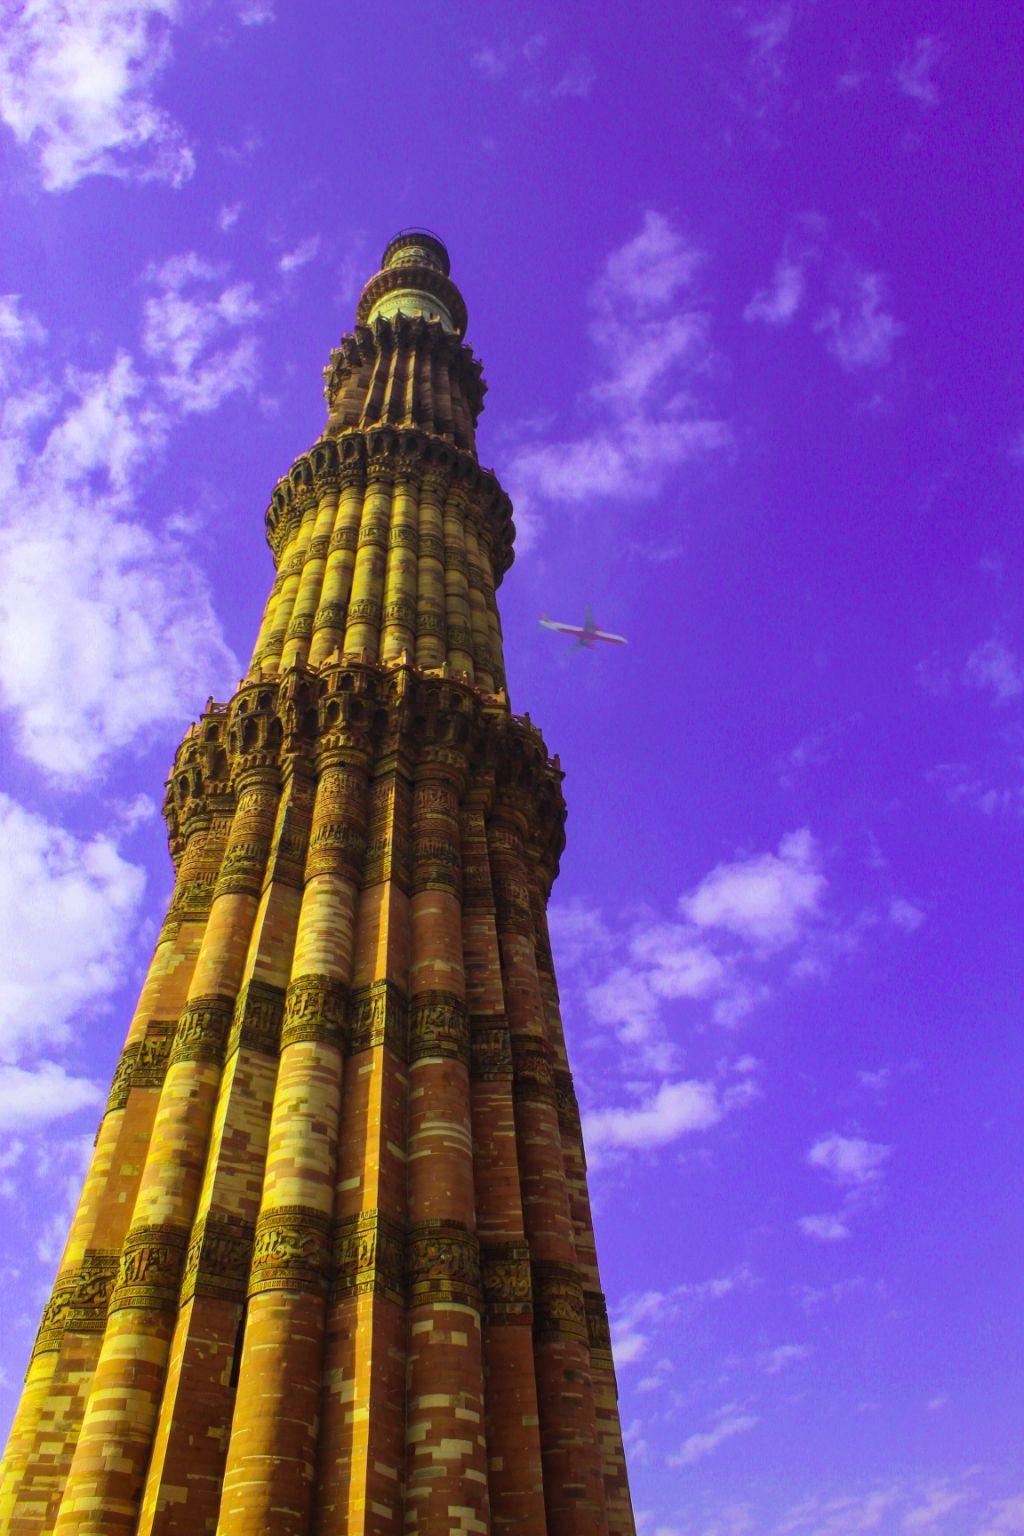 Photo of Qutub Minar By Neel Banerjee